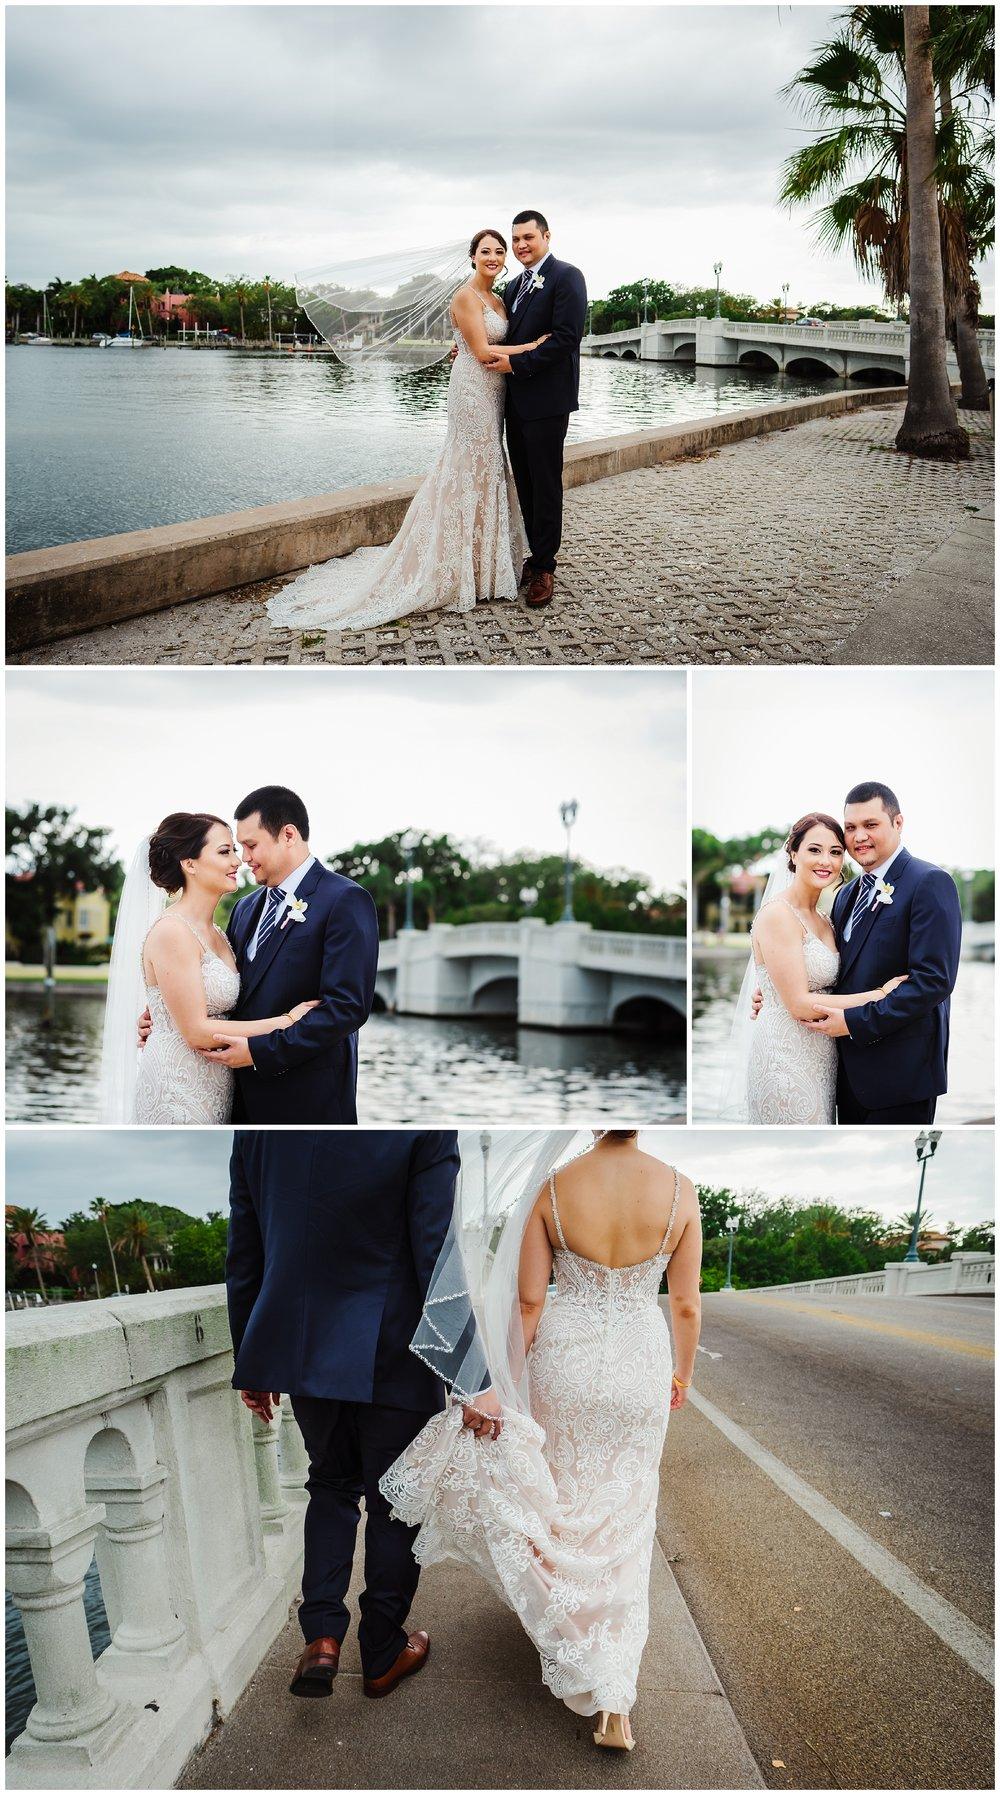 vinoy-sunset-ballroom-rainy-day-wedding-photography-orchids-trinidad-flawless-fetes-ashlee-hamon_0135.jpg